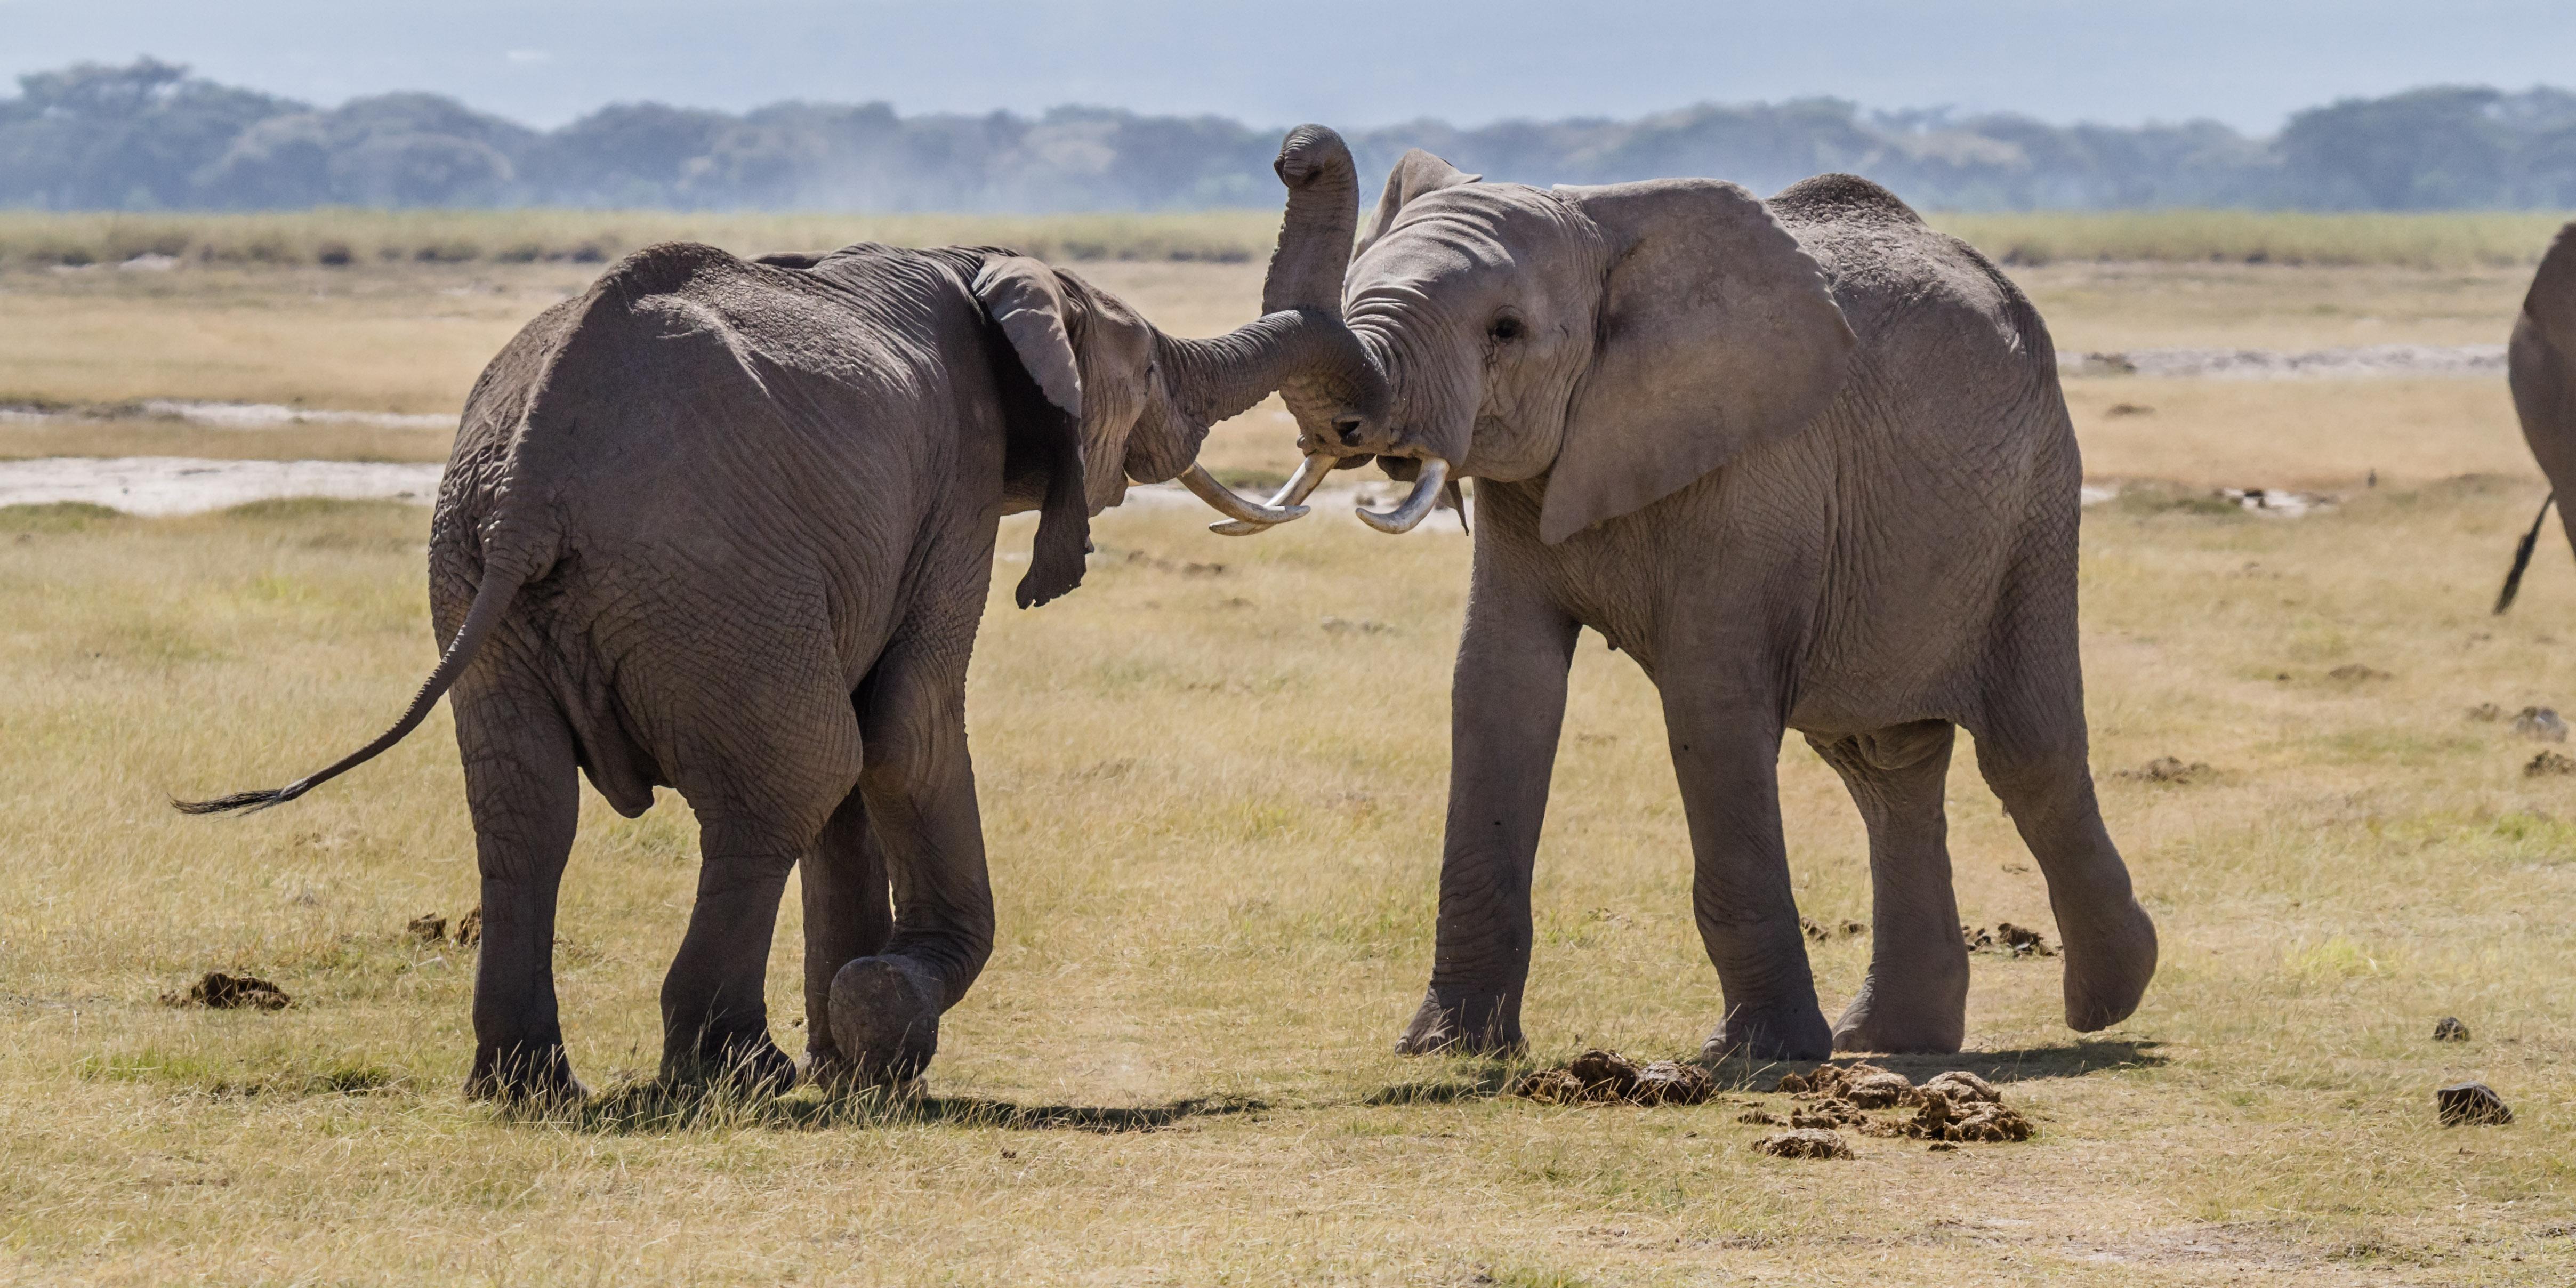 Internet of Things, Elephants